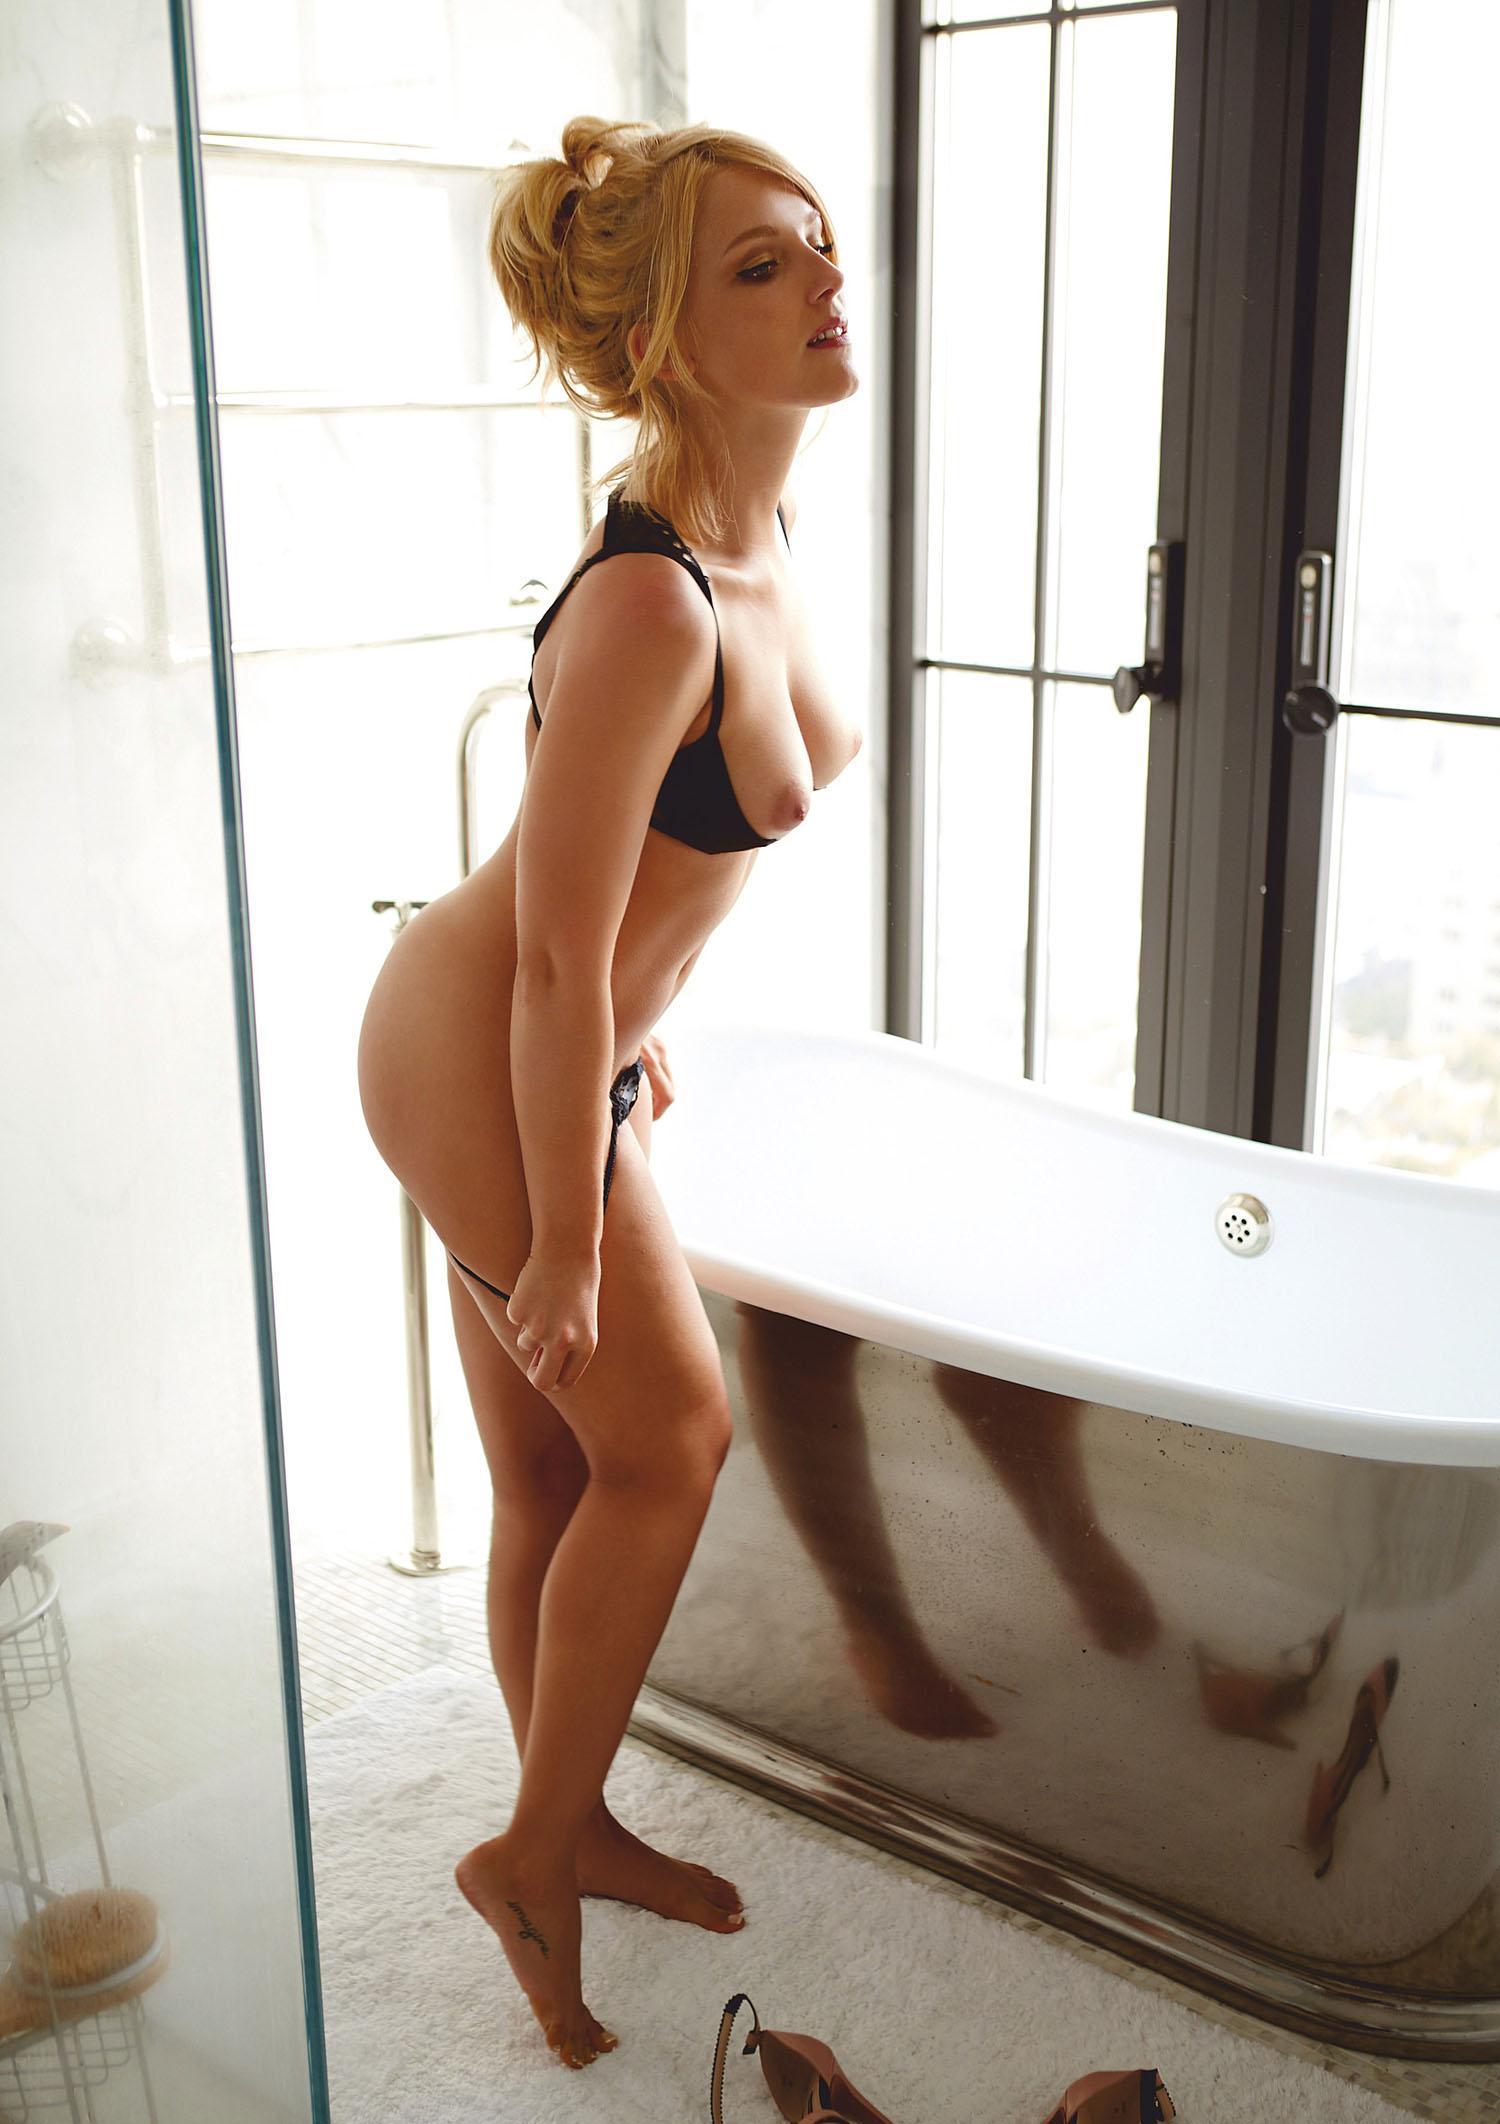 Ирис Марайке Штин голая. Фото - 36